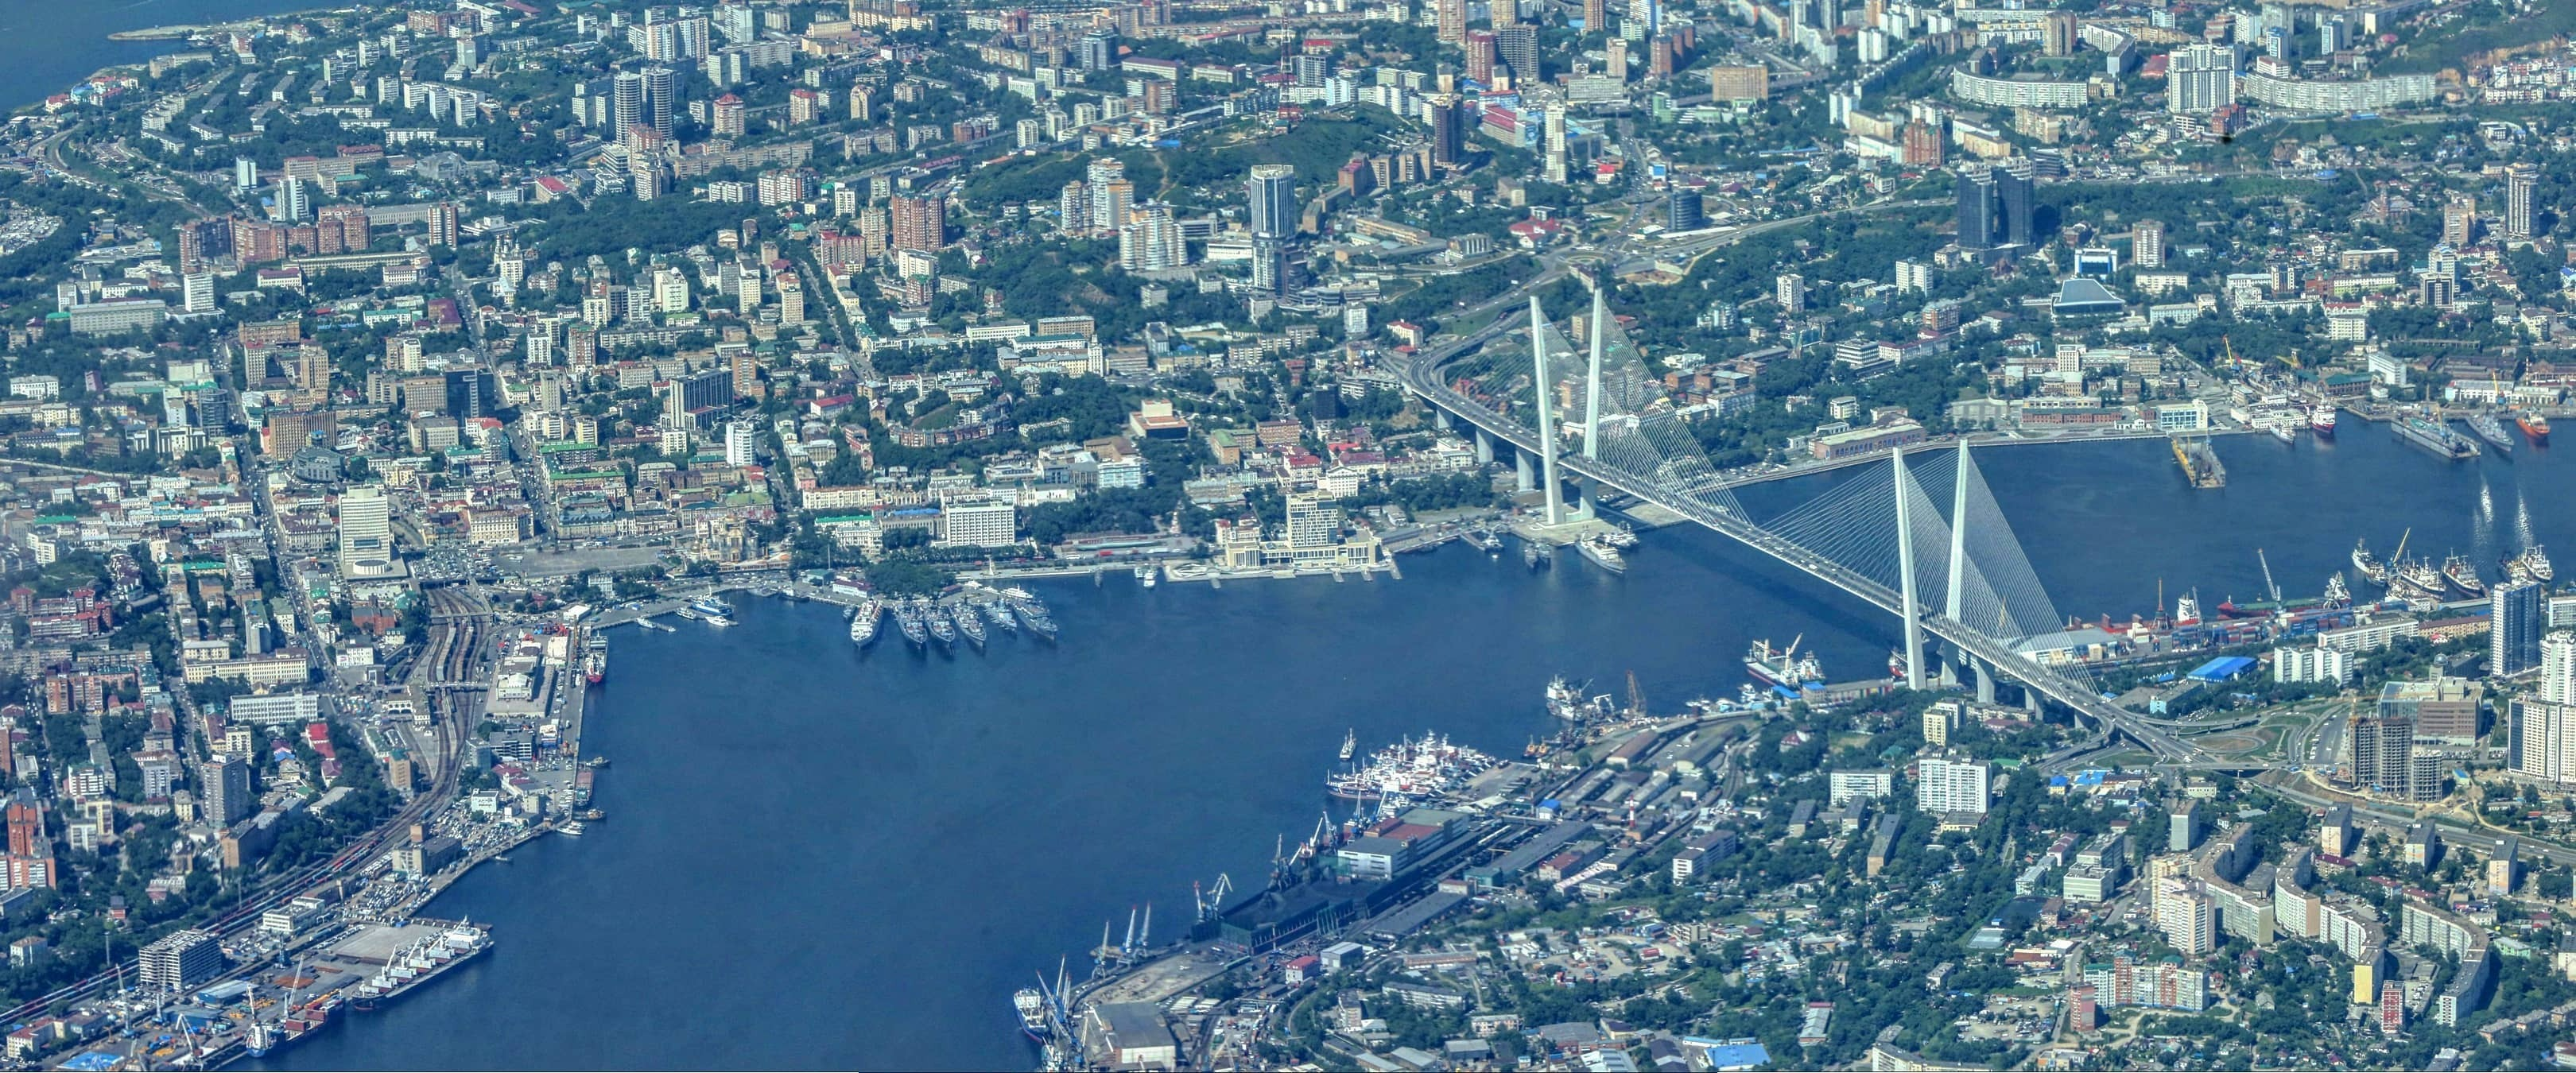 владивосток панорамные фото города армандо